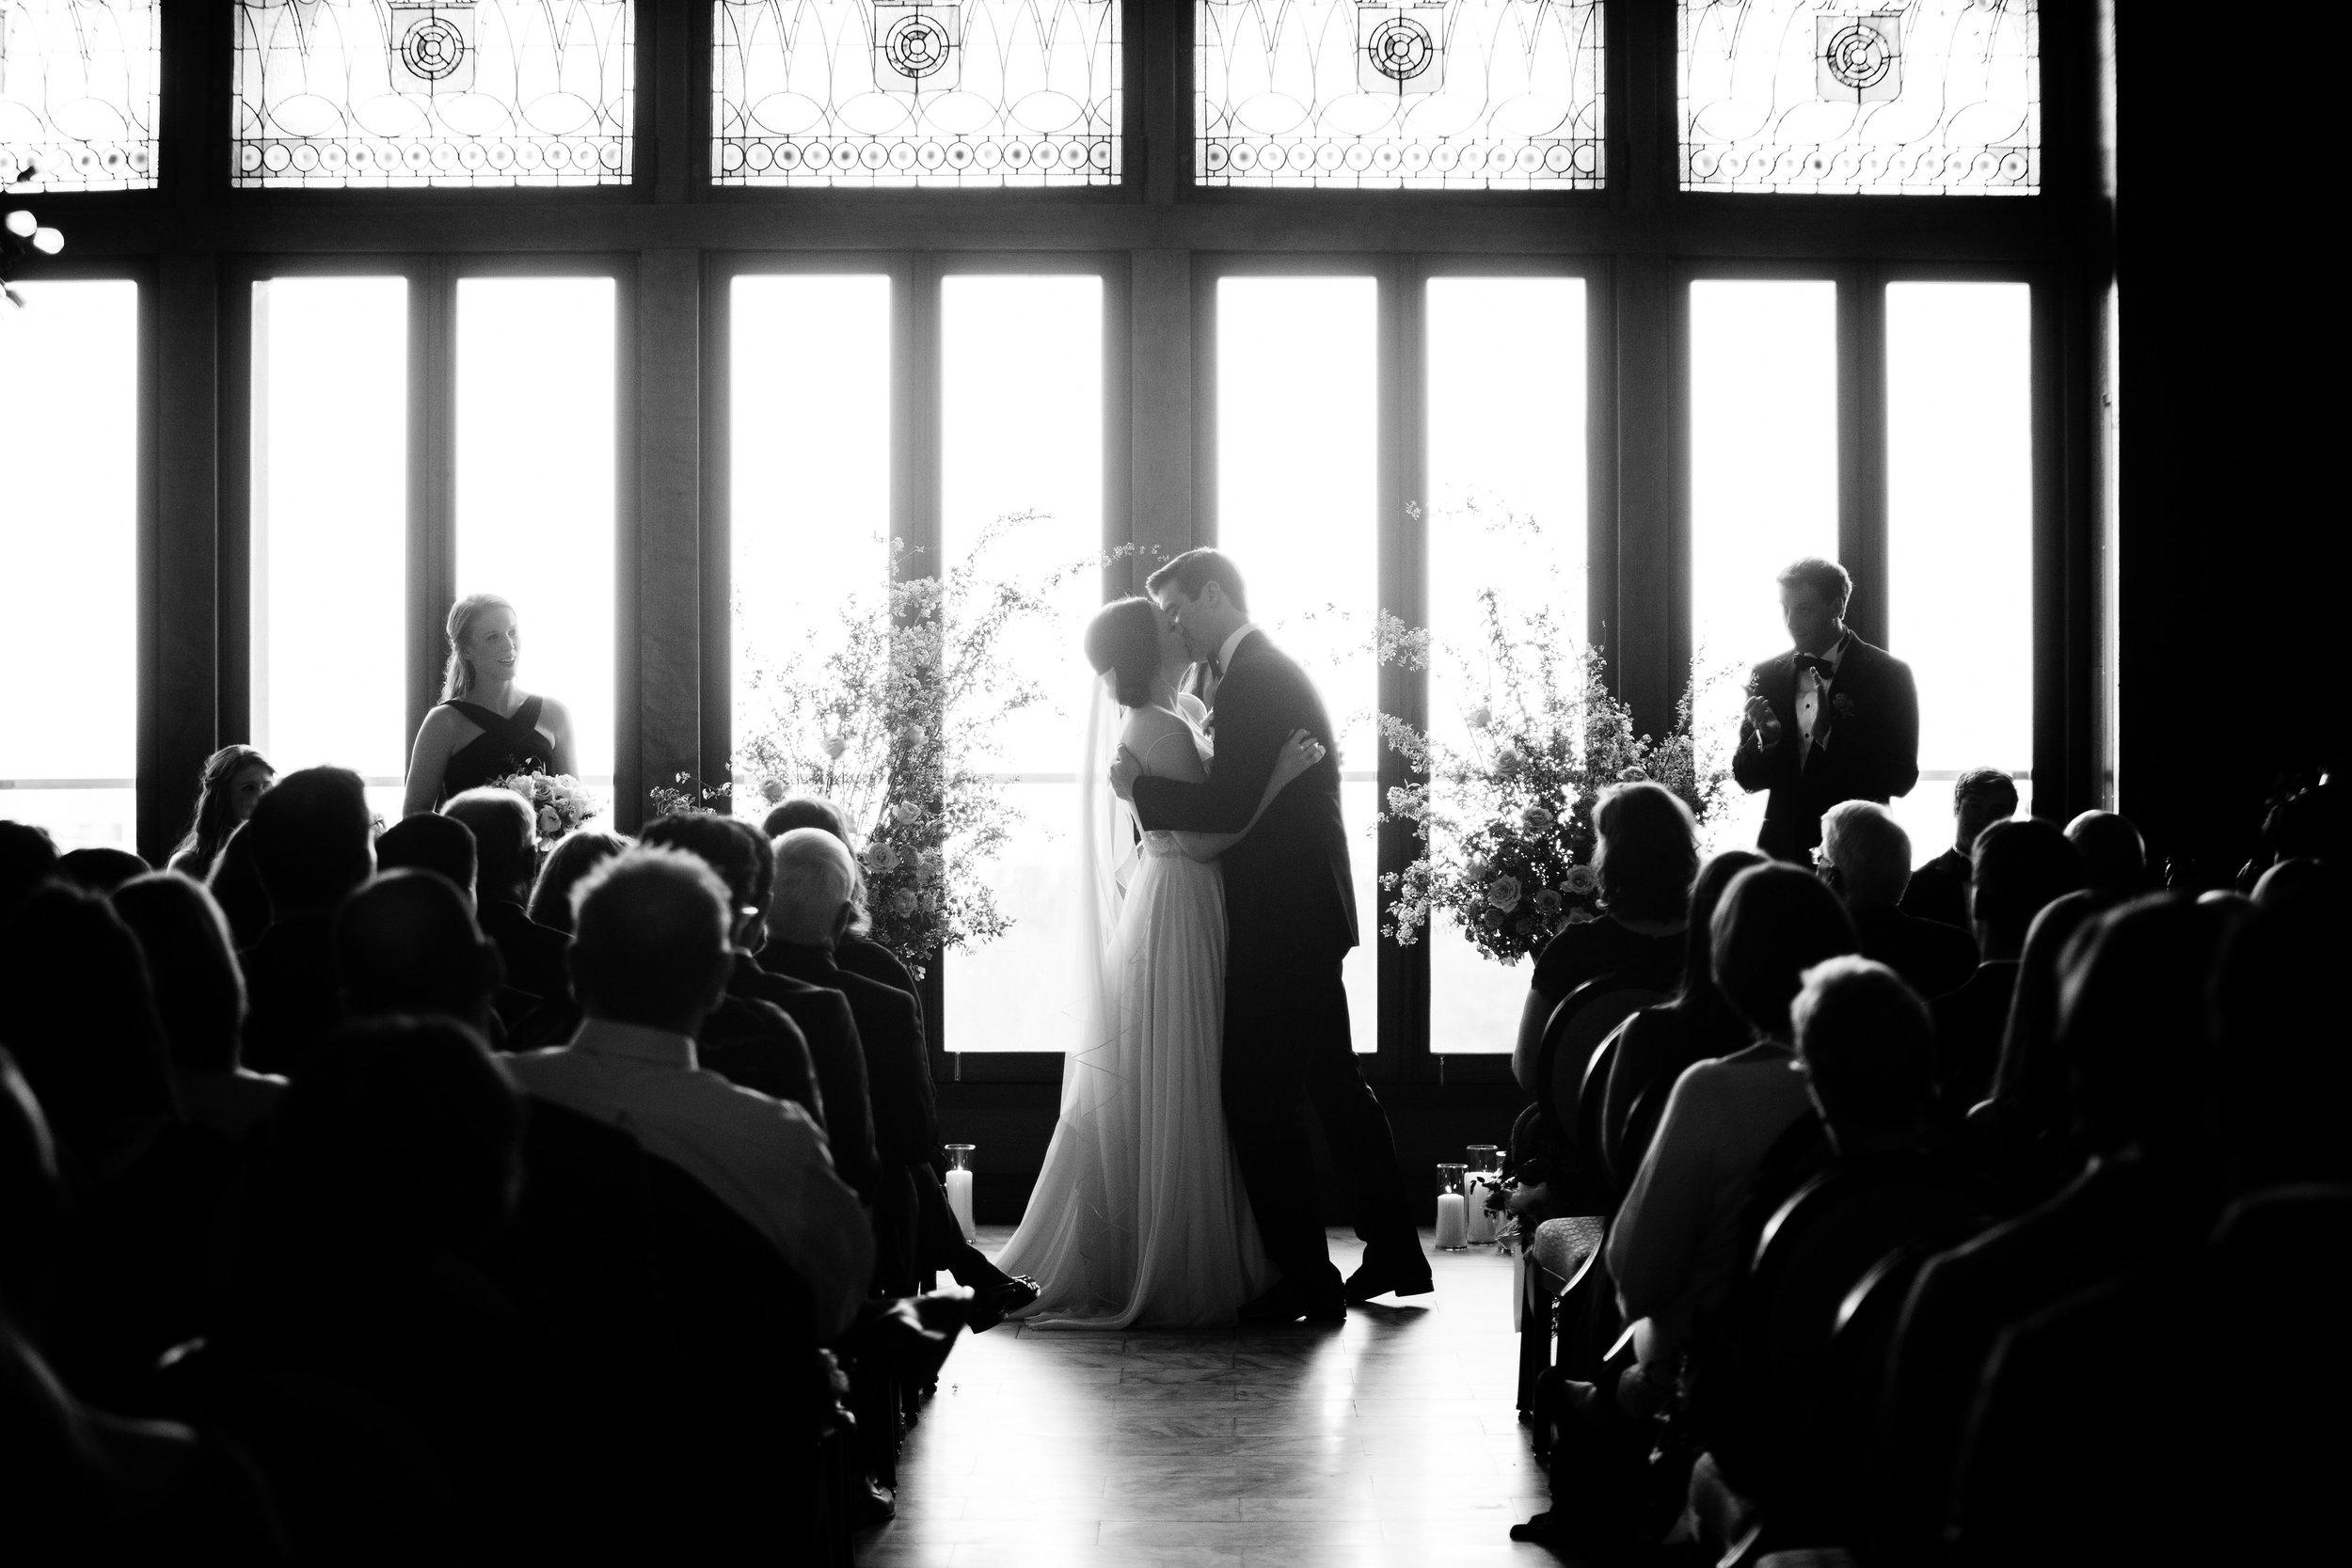 Fleur-Inc-Wedding-Chicago-Athletic-Association-Kina-Wicks-Photography-LIven-It-Up-Ceremony-Decor-White-City-Ballroom